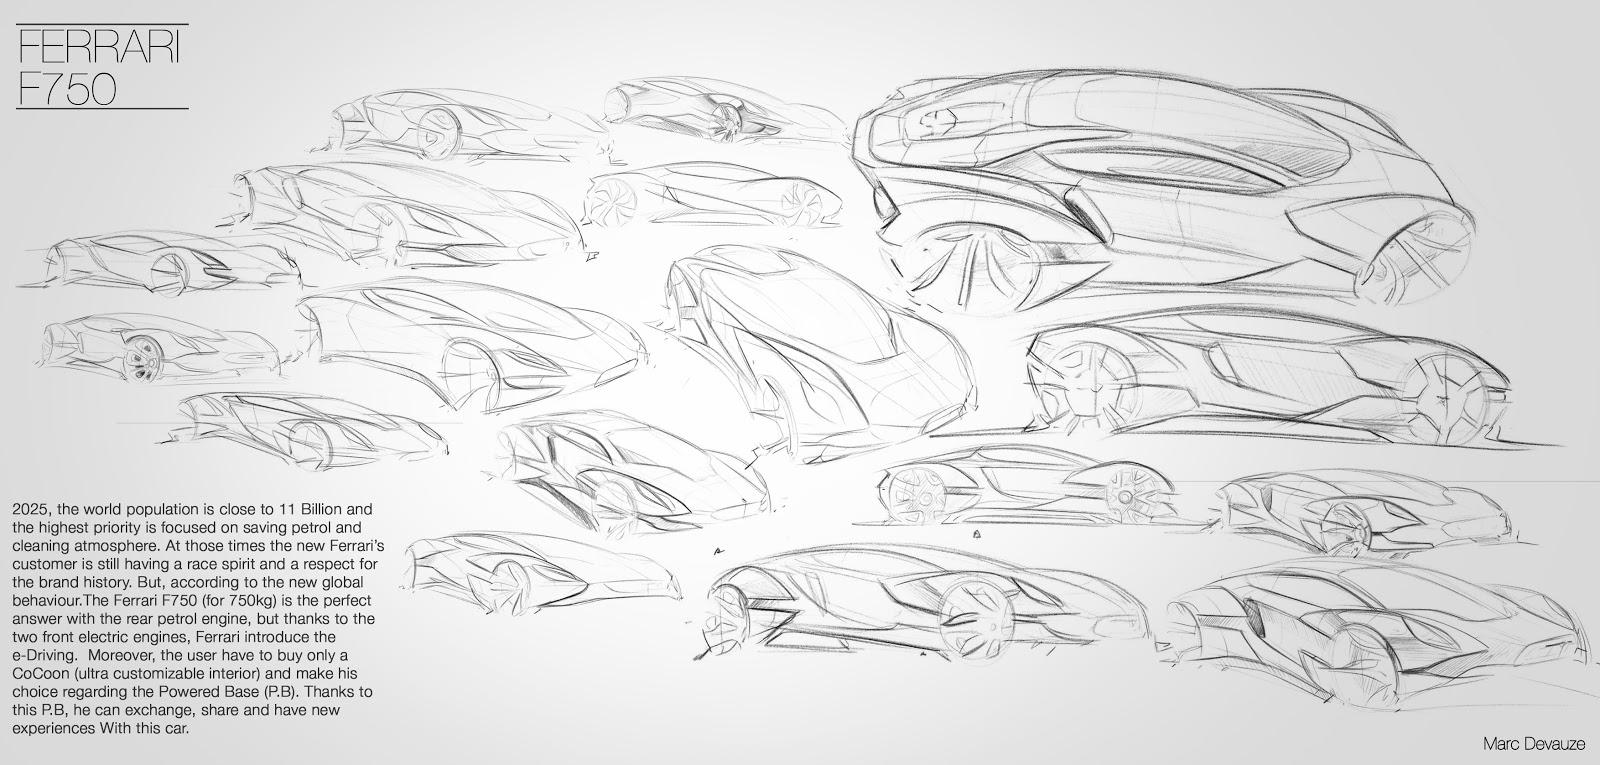 Devauze Design Ferrari World Design Chalenge 2011